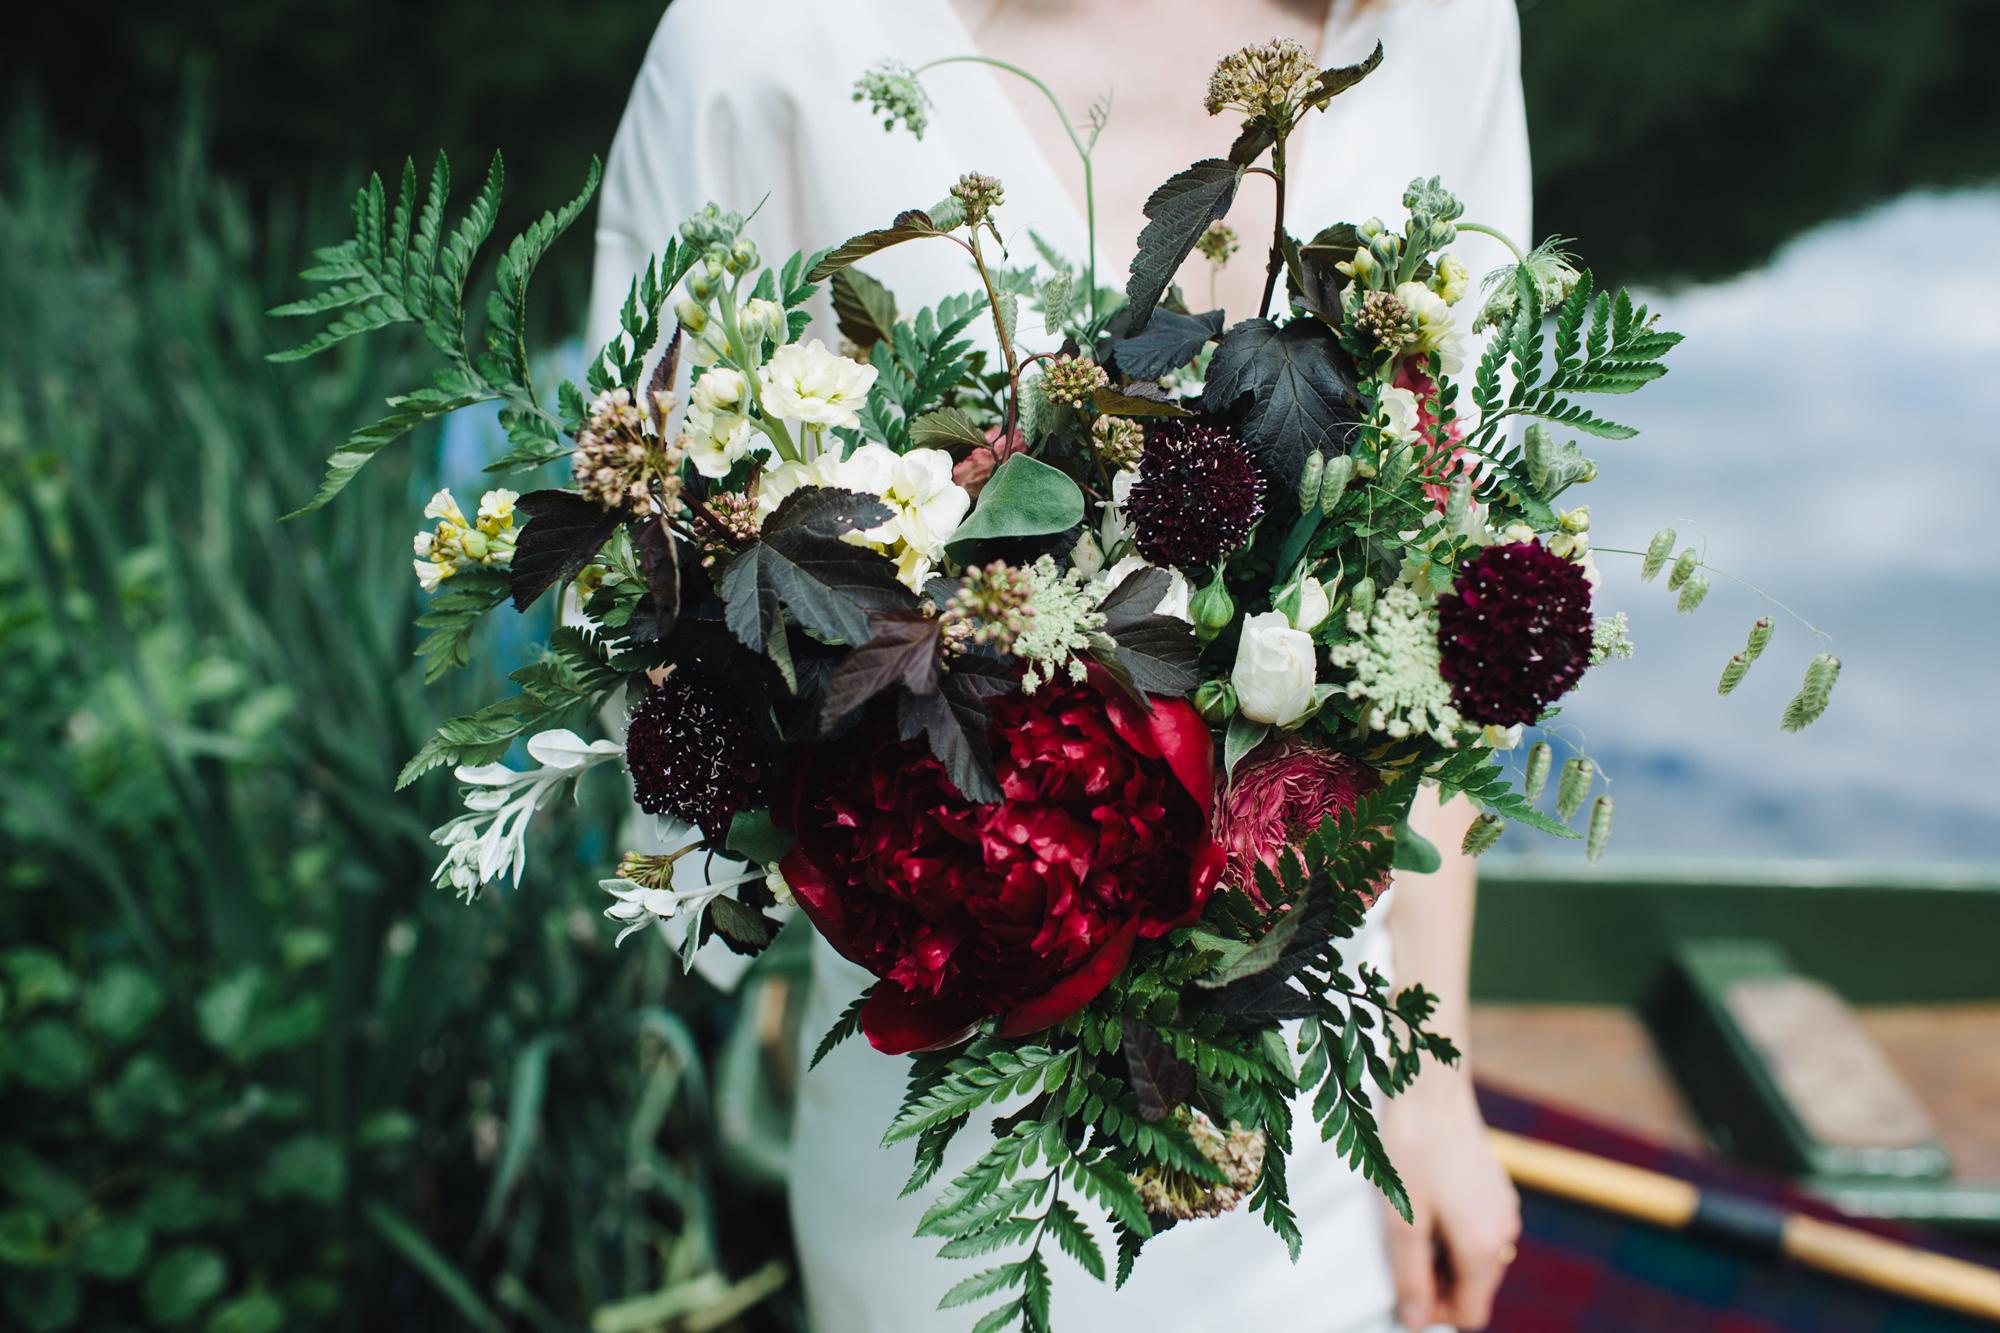 Hermione McCosh Photography - wedding photographer London - creative, candid, natural